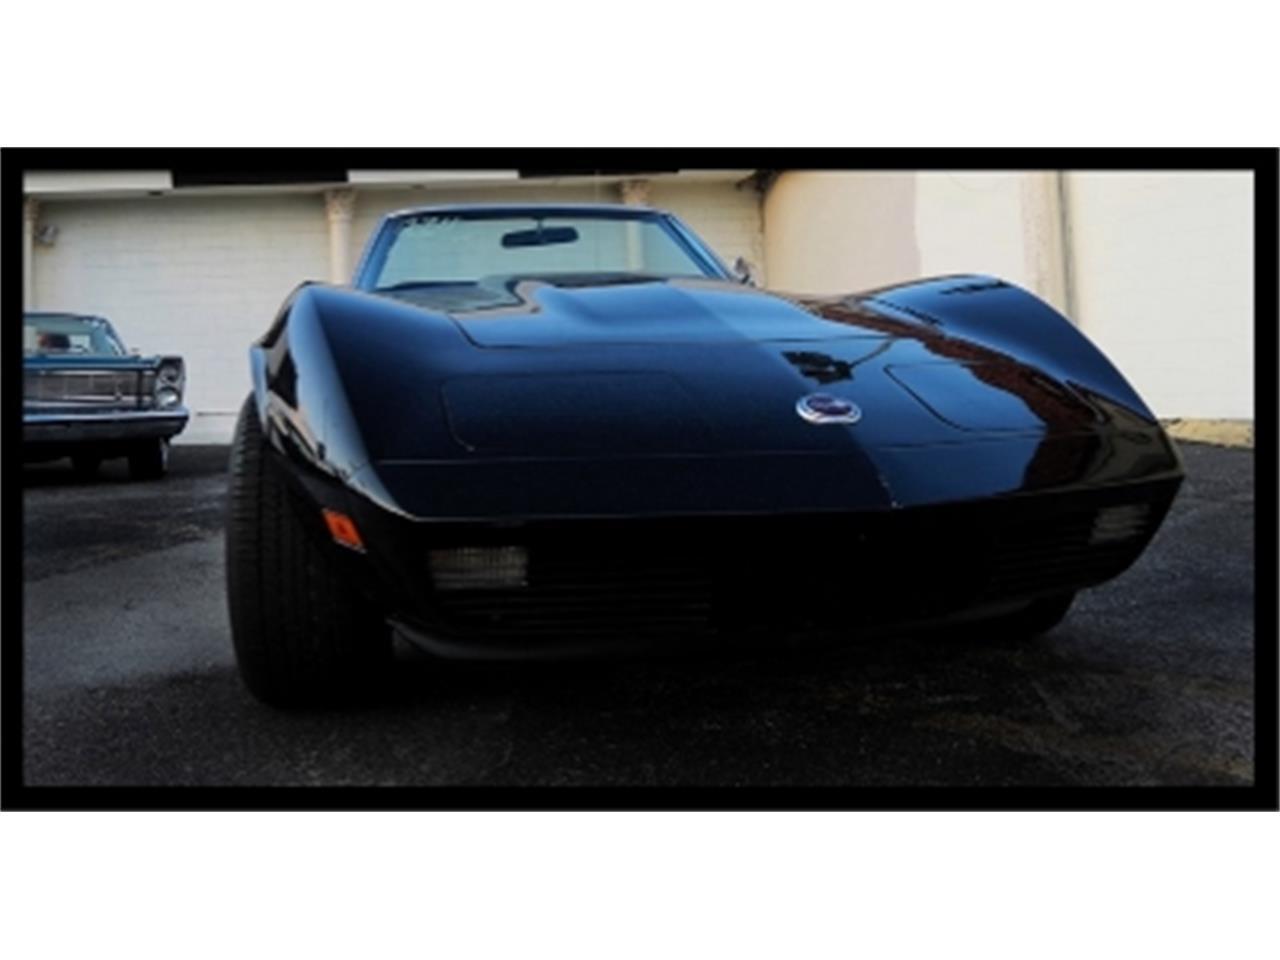 Large Picture of '74 Chevrolet Corvette located in Miami Florida - $32,500.00 Offered by Sobe Classics - CRI8